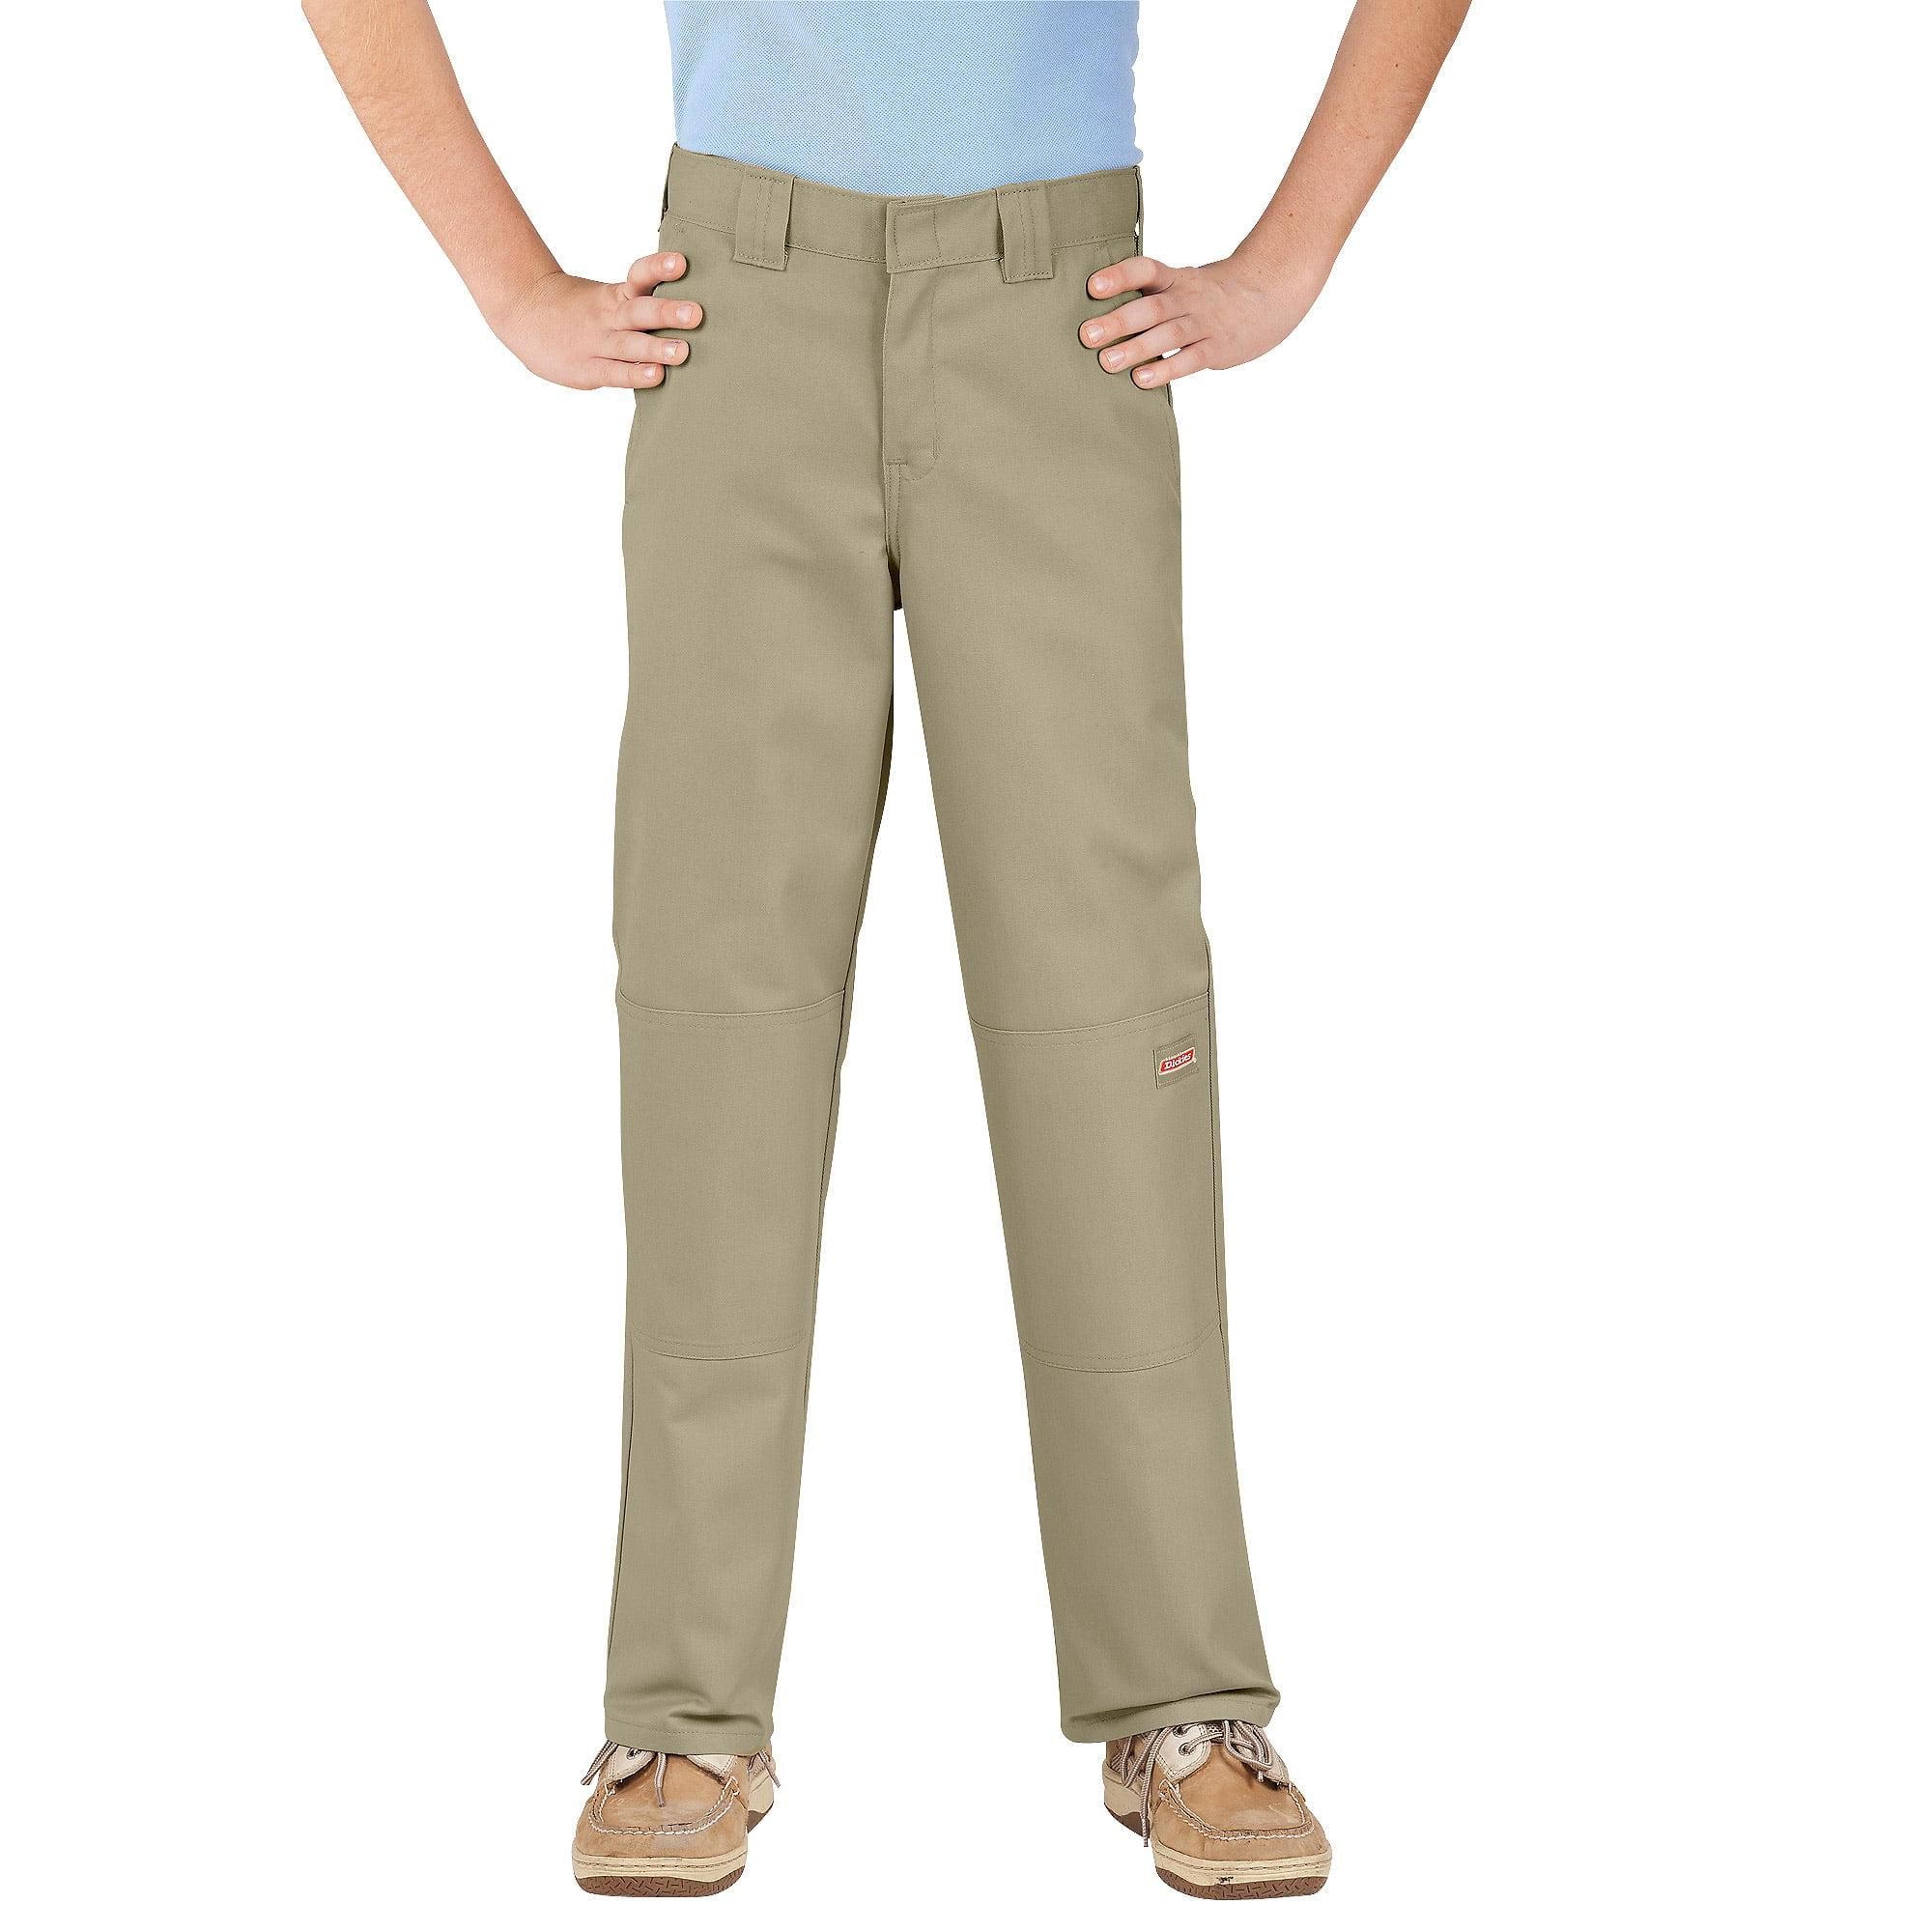 Genuine Dickies Boy's Double-Knee Multi Pocket Twill Pants ...